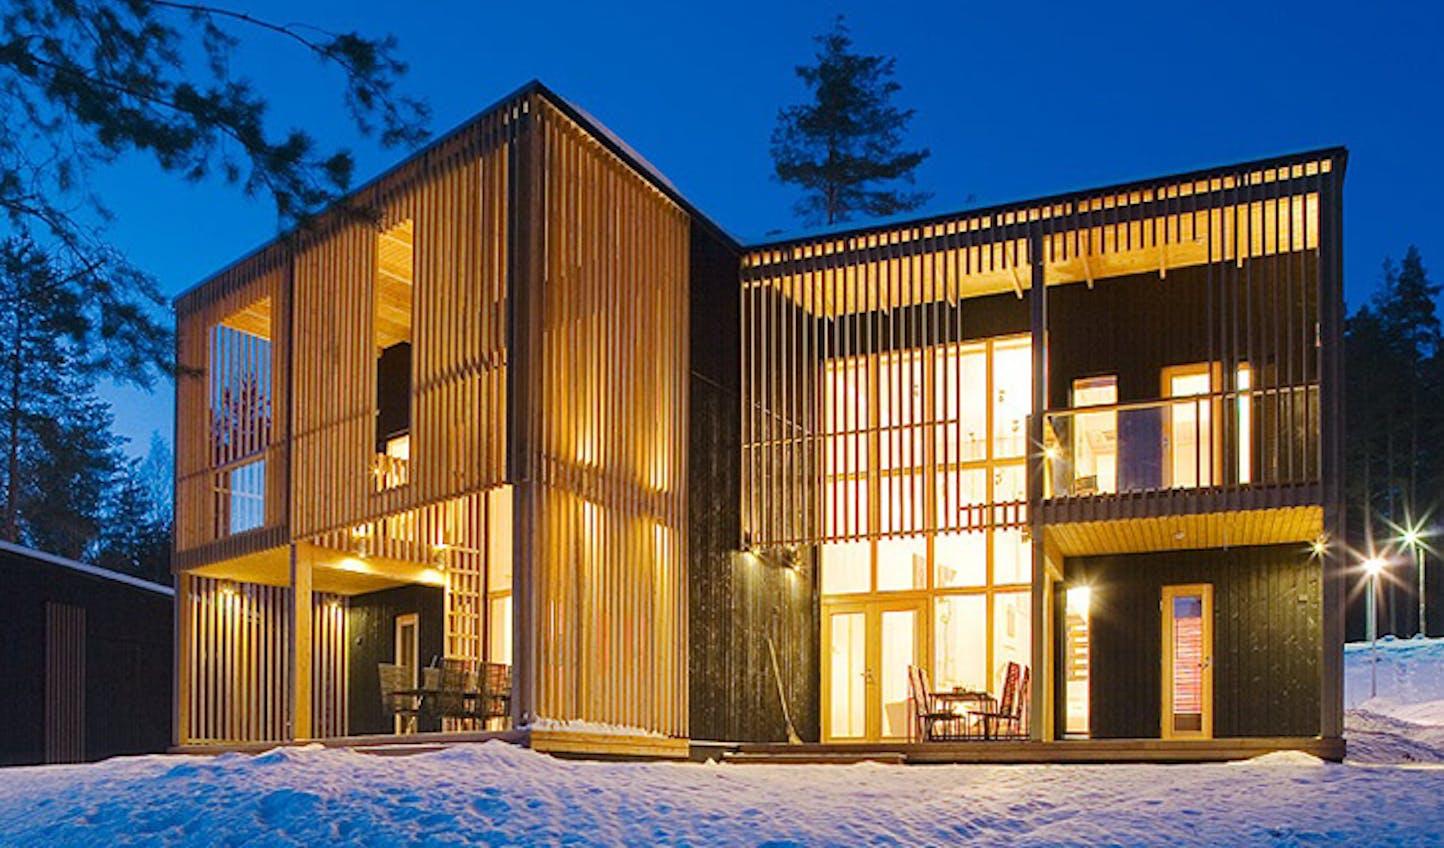 Winter villa, Finland